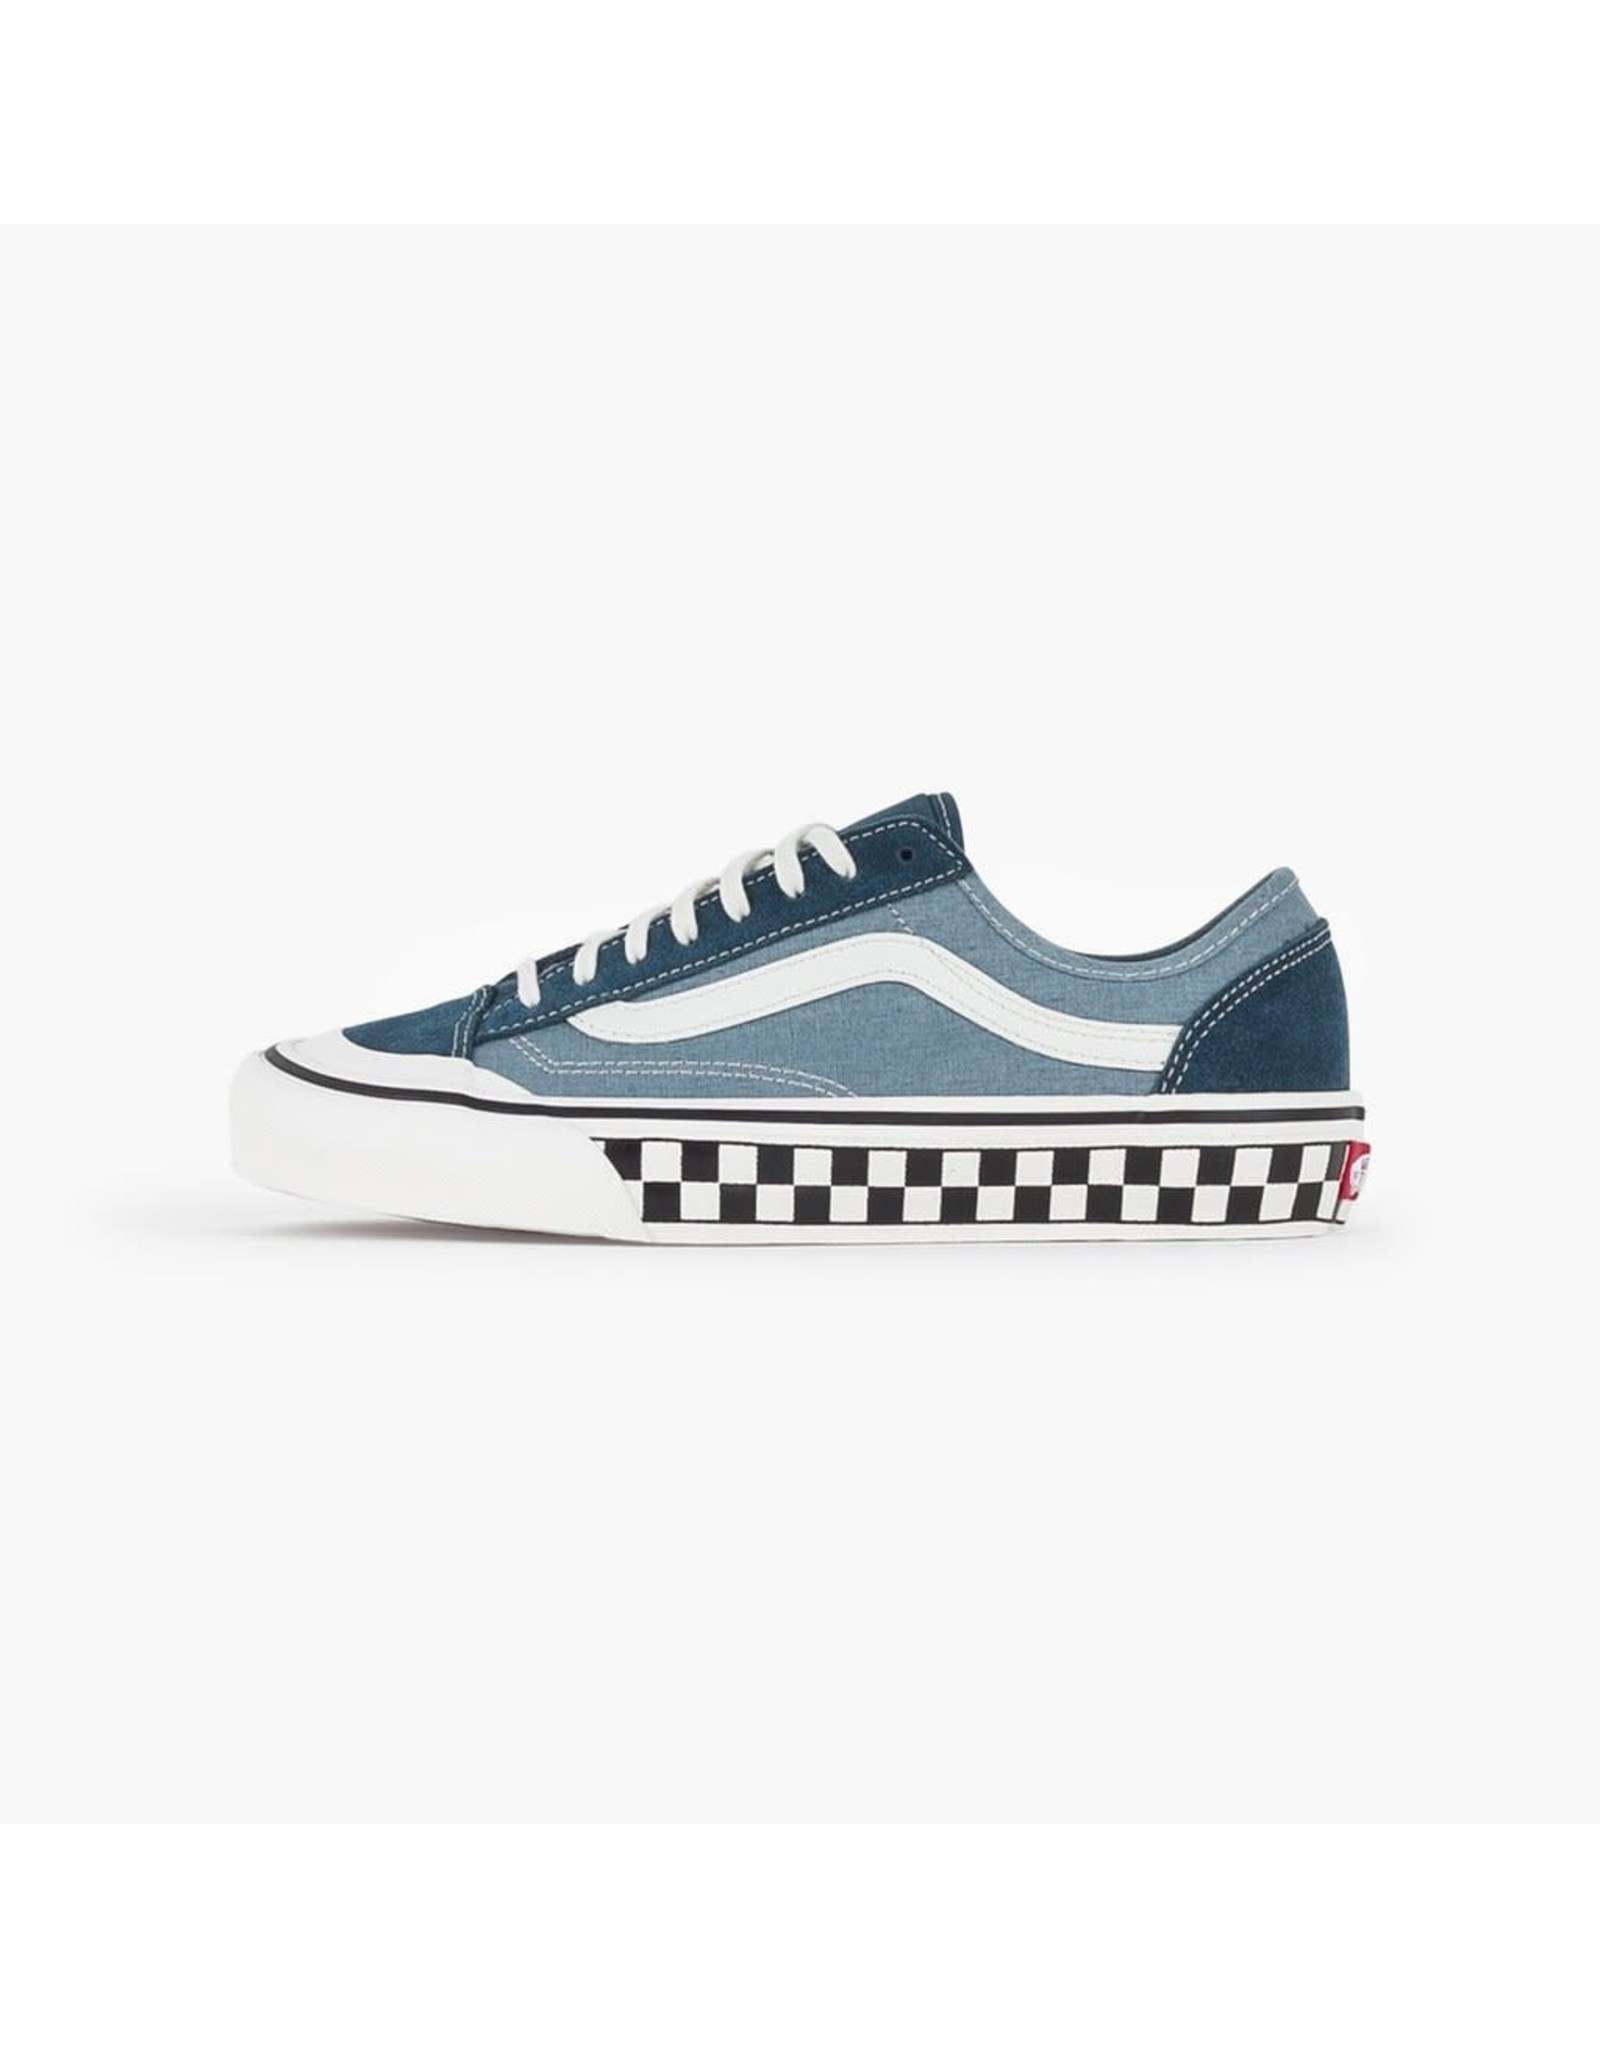 vans Vans - soulier style 36 Decon SF (salt wash) Star